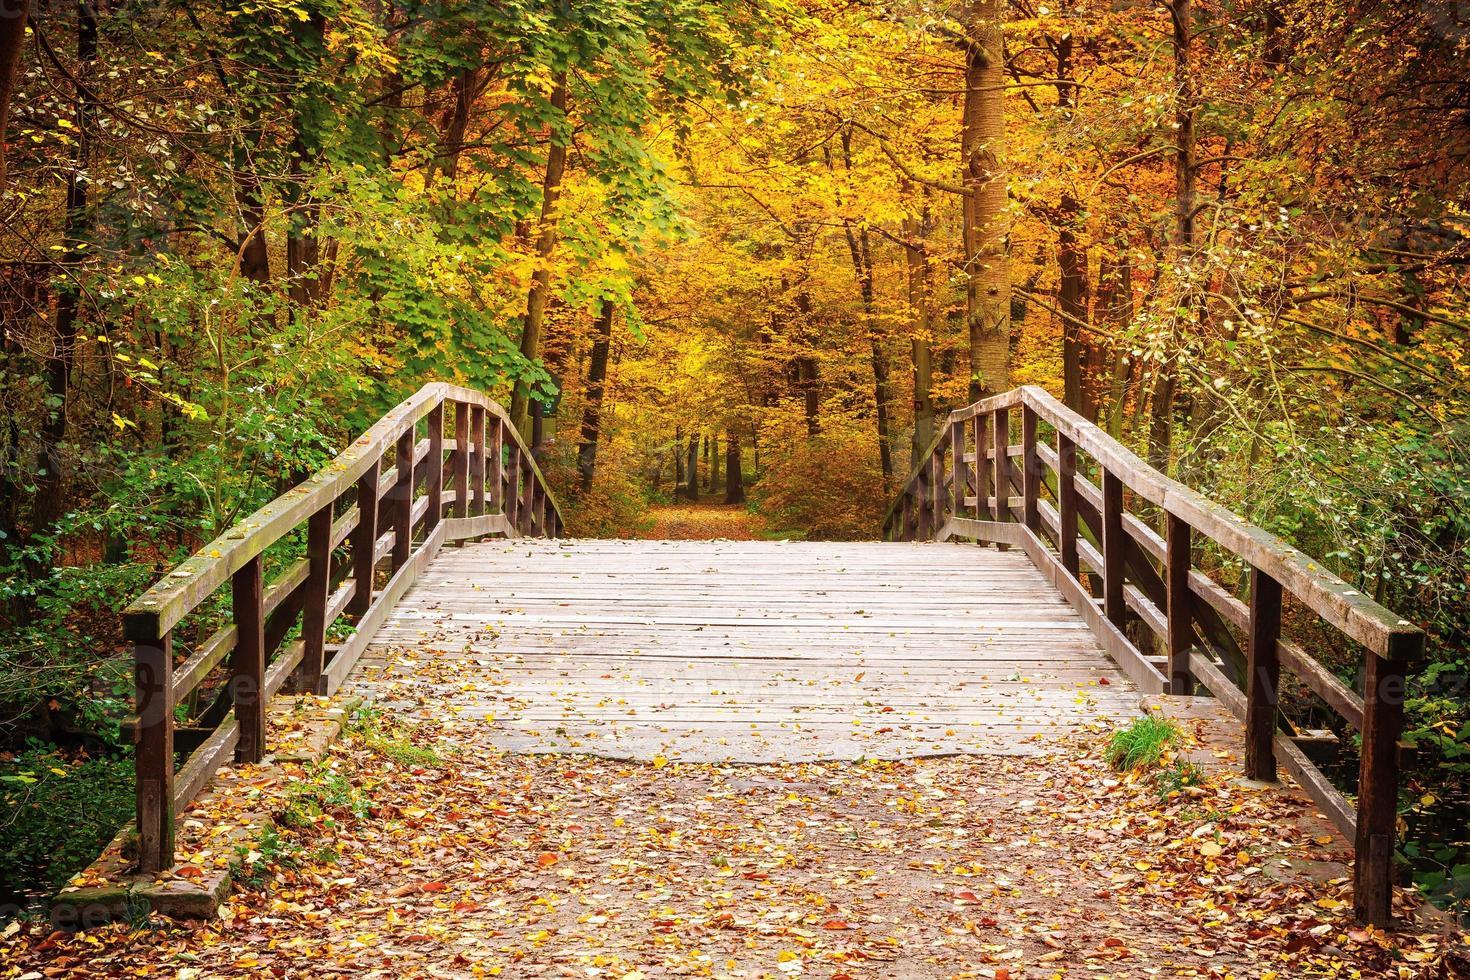 Bridge in autumn forest photo